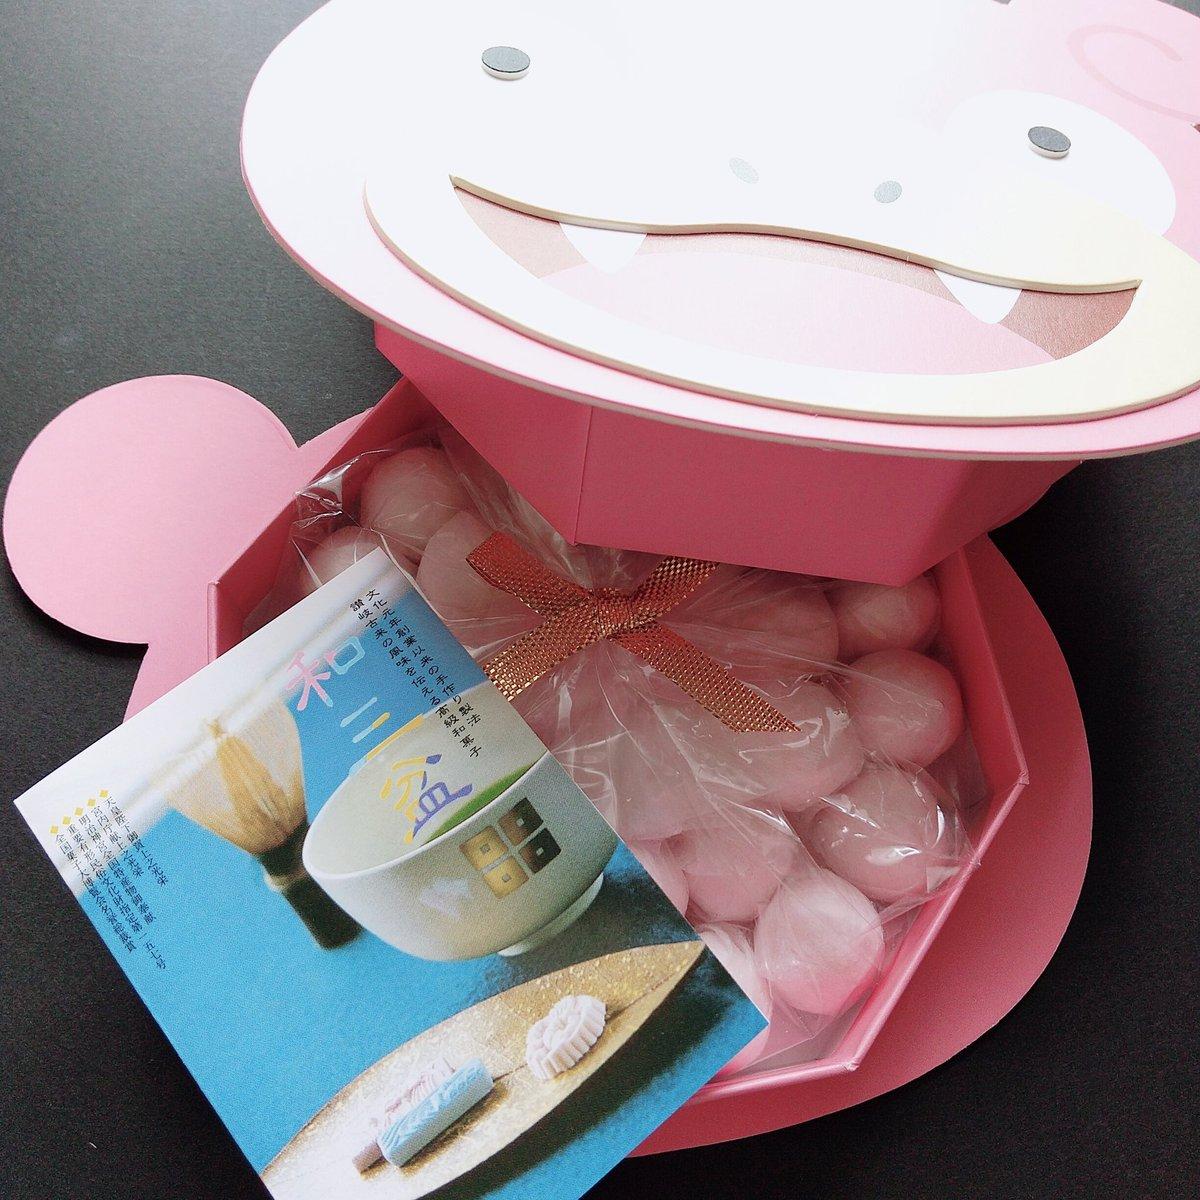 test ツイッターメディア - 香川でしか買えないヤドン和三盆が、今だけ通販してるよ案件その2!これは三谷製糖さんのやつ。 https://t.co/0Ck209cQgd